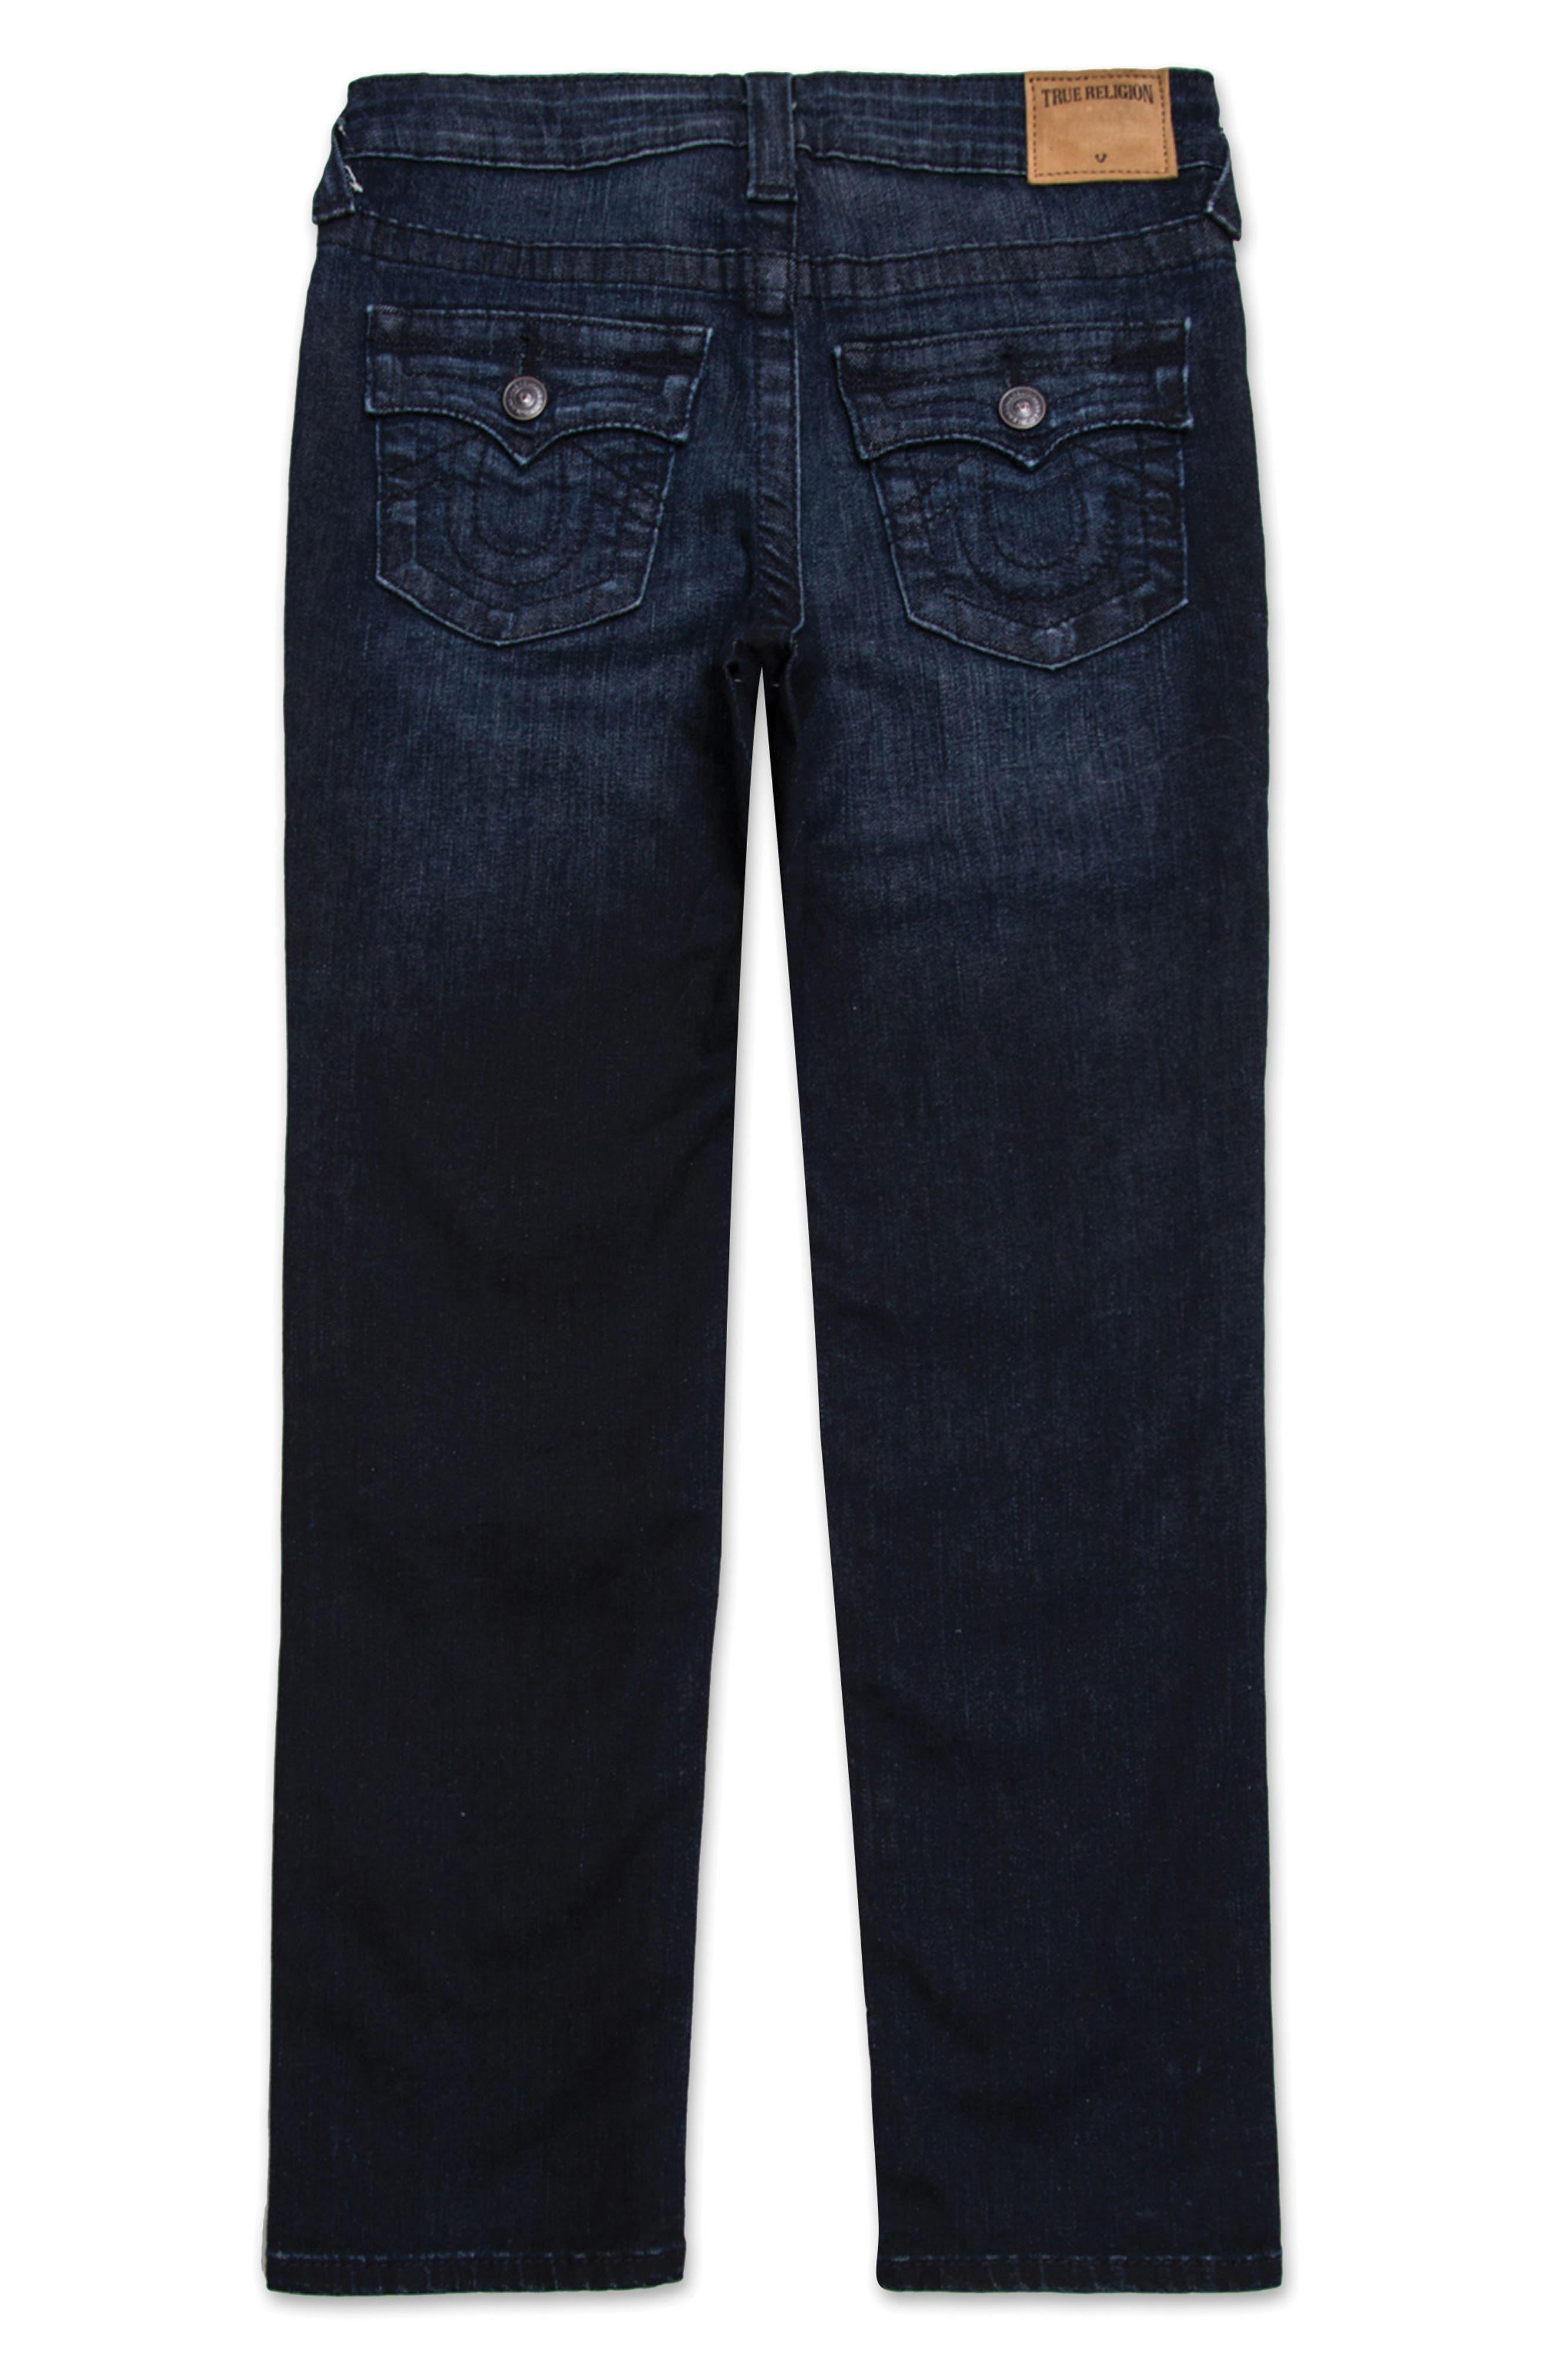 Geno Relaxed Slim Fit Jeans,                             Main thumbnail 1, color,                             BLUE ASPHALT WASH